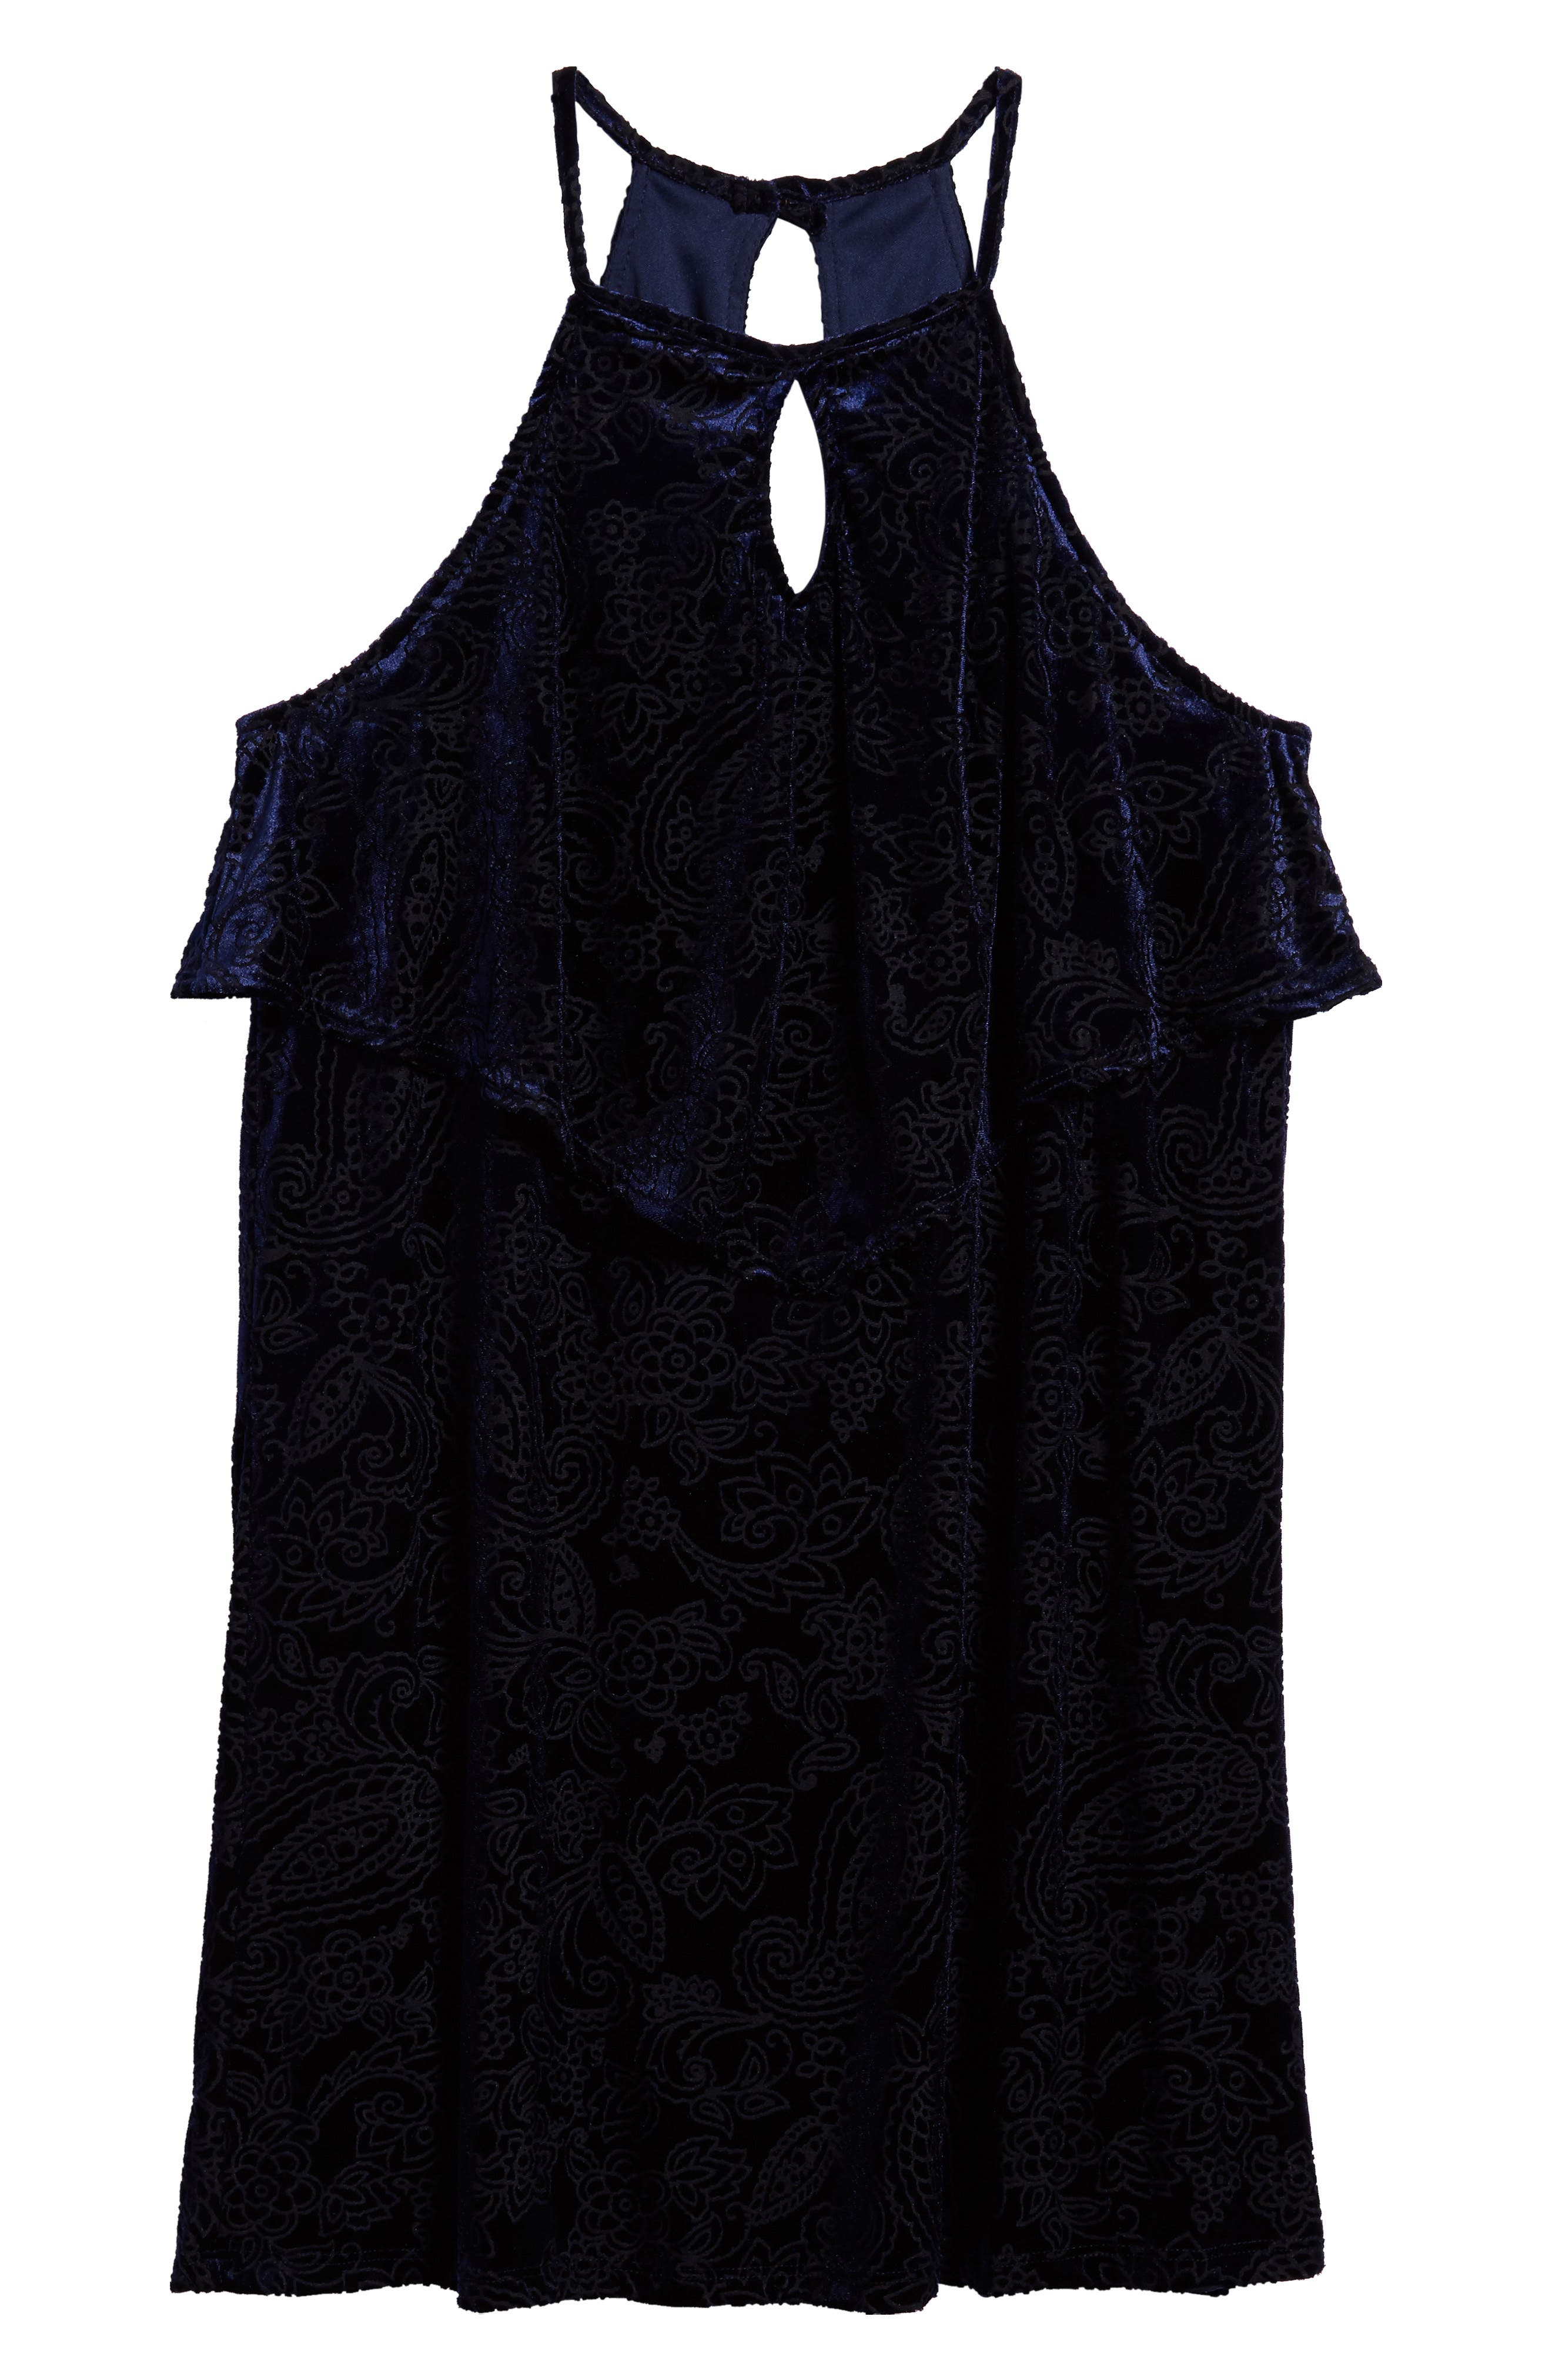 Main Image - Mia Chica Burnout Velvet Dress (Big Girls)